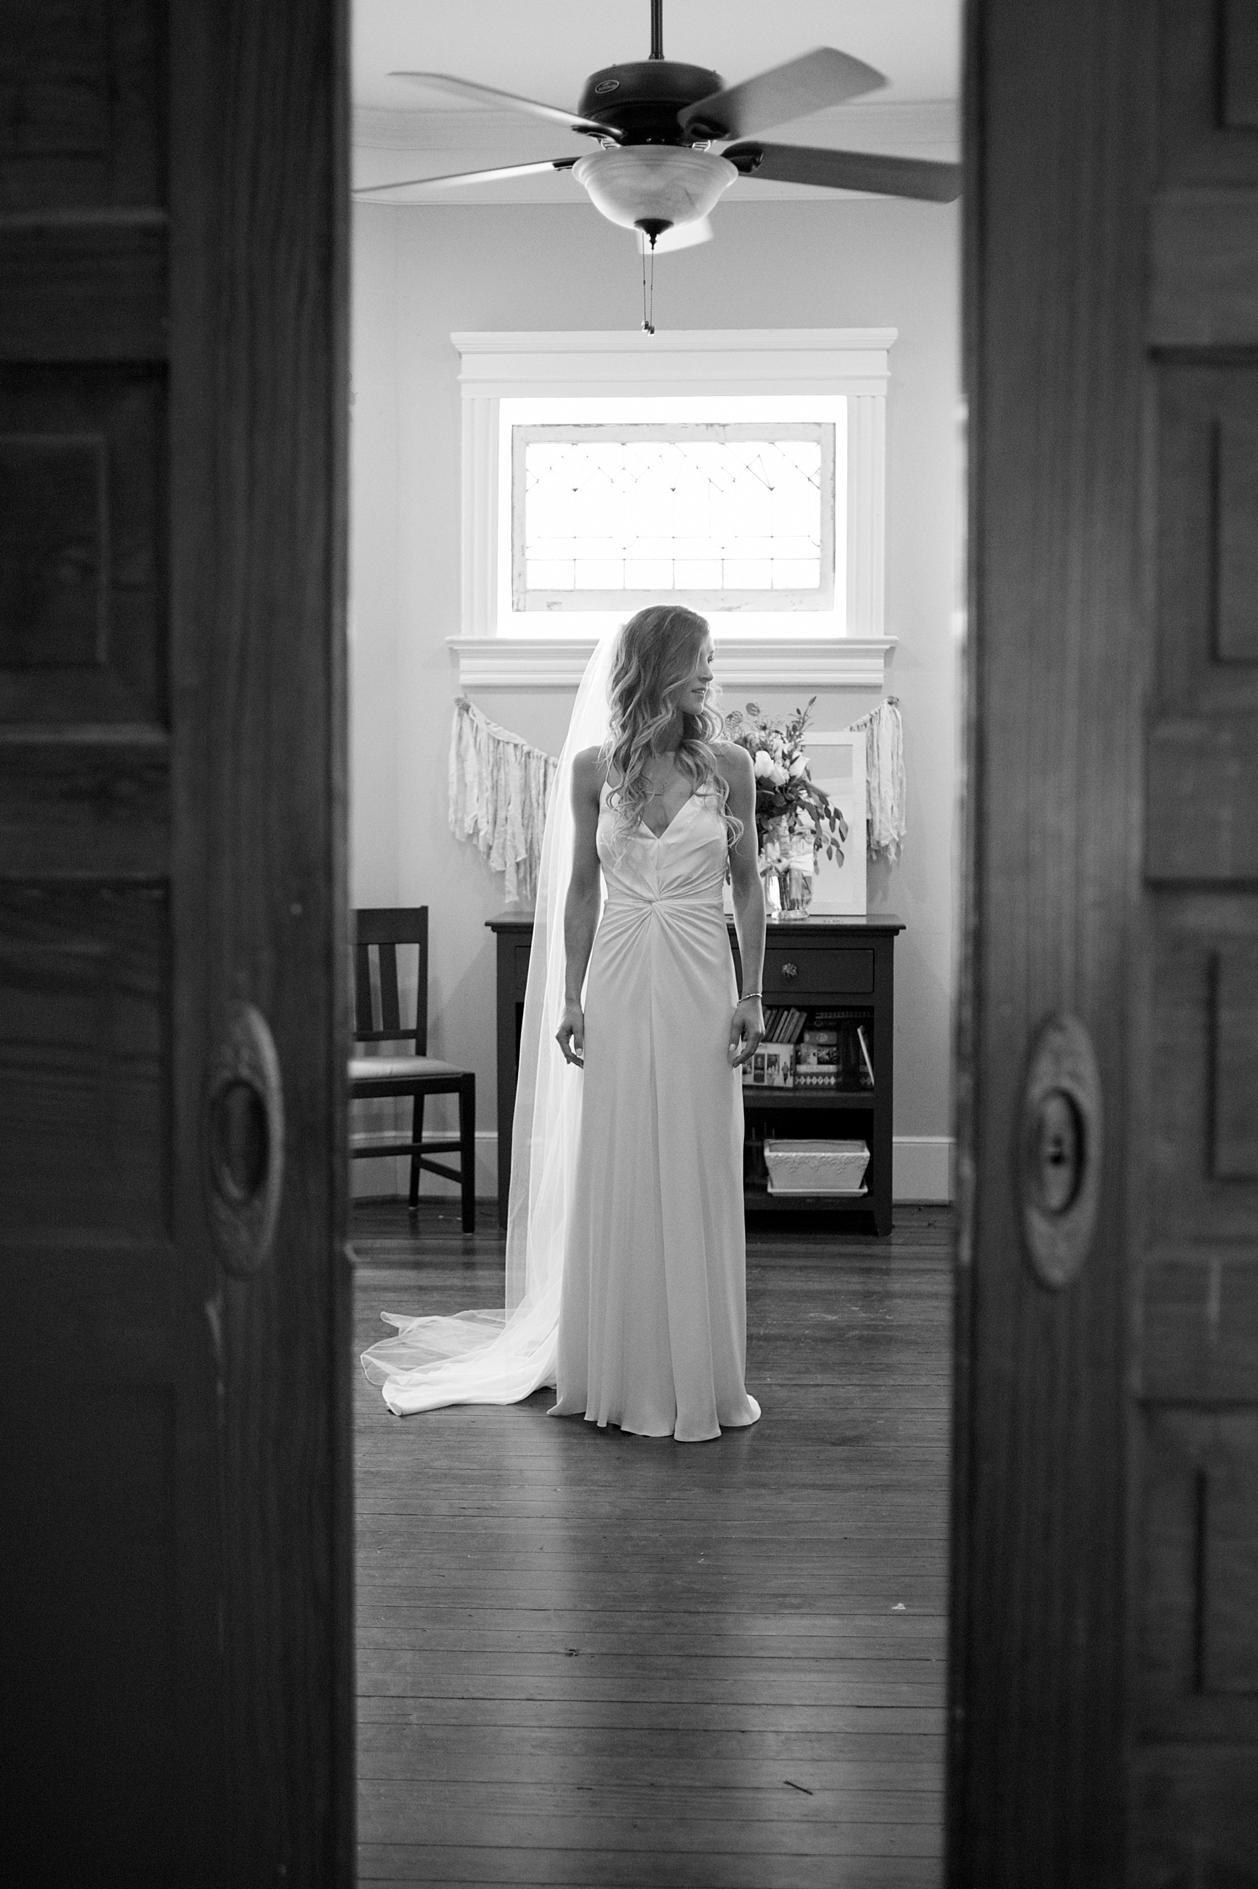 Bloom&Lo_AtlantaPhotographer_AmeliaTatnall_2015_Wedding_Georgia_Atlanta_AmbientStudio_Sara&Jared_Blog_Portfolio__0024.jpg